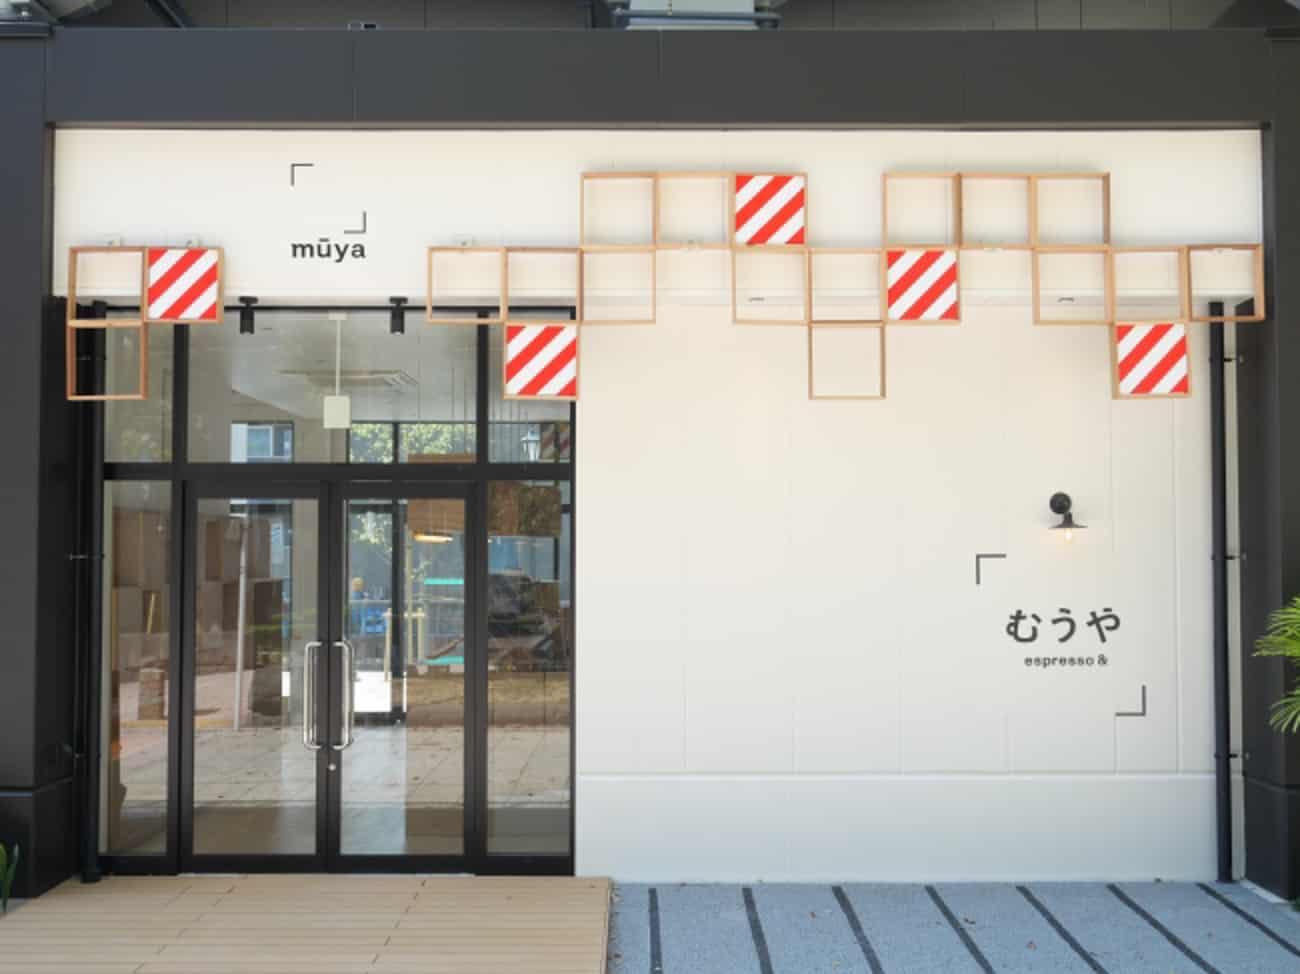 TOKYO Mizumachi ทางฝั่ง West Zone (อาซากุสะ) - muya (むうや) ร้านขนมปังแถว Mou ยอดฮิตของร้านเบเกอรี่ BREAD, ESPRESSO &